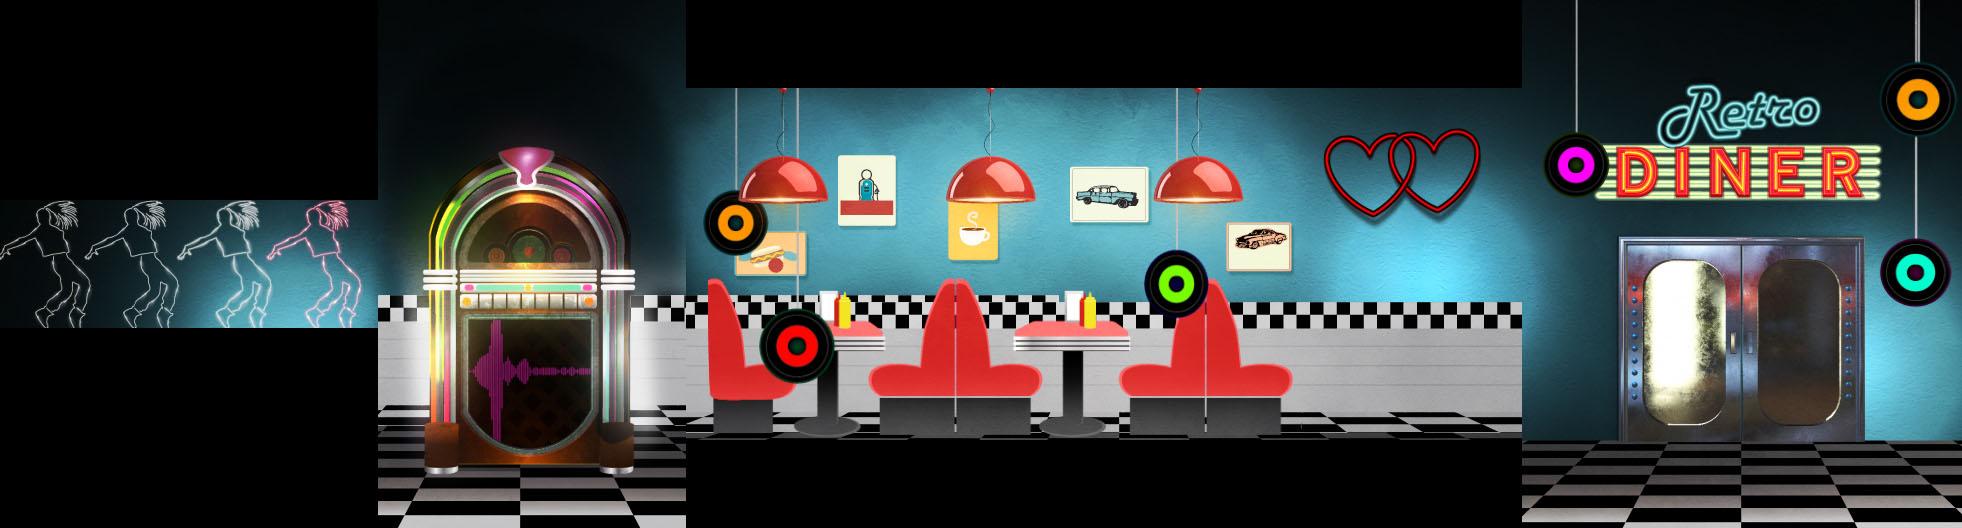 Diner - Got Talent Israel by Elad Magdasi